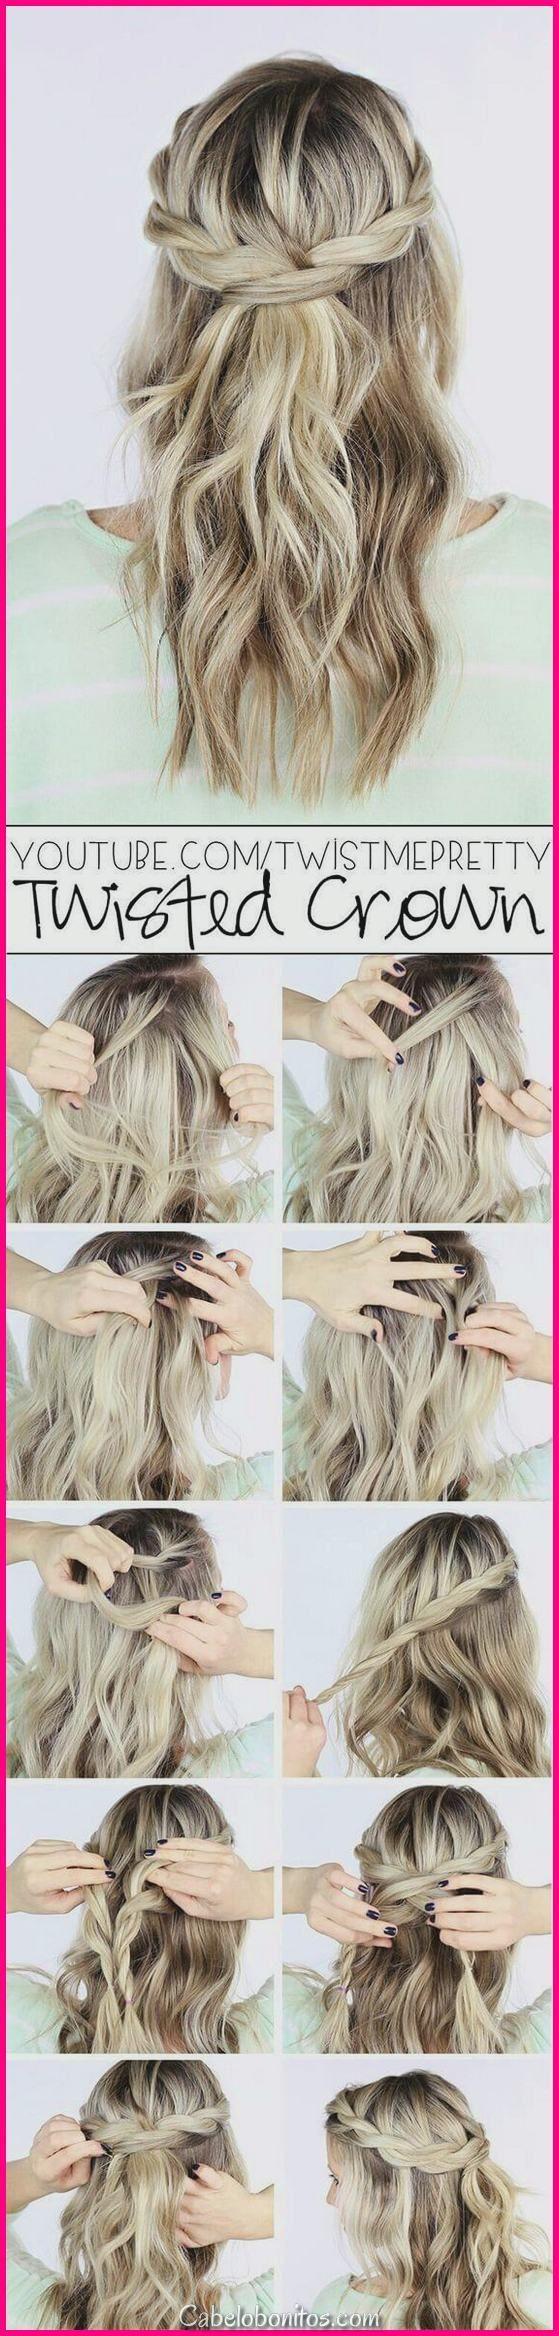 Amazing Hairstyles for African American Black Women hairstyles, black women hairstyles, braids, box braids, cornrows braids, bantu knots, ponytails, half ponytails, updo hairstyles, half updo, sewing hairstyles, cornrows, tribal braids, protective hairstyles, natural hairstyles, #boxbraids #africanamericanhairstyles #blackwomenhairstyles #naturalhairstyles #protectivehairstyles #cornrowsbraids #braids #braidedhairstyles #bantuknots #bob #ponytails #updohairstyles #tribalbraids #sewinghairstyles